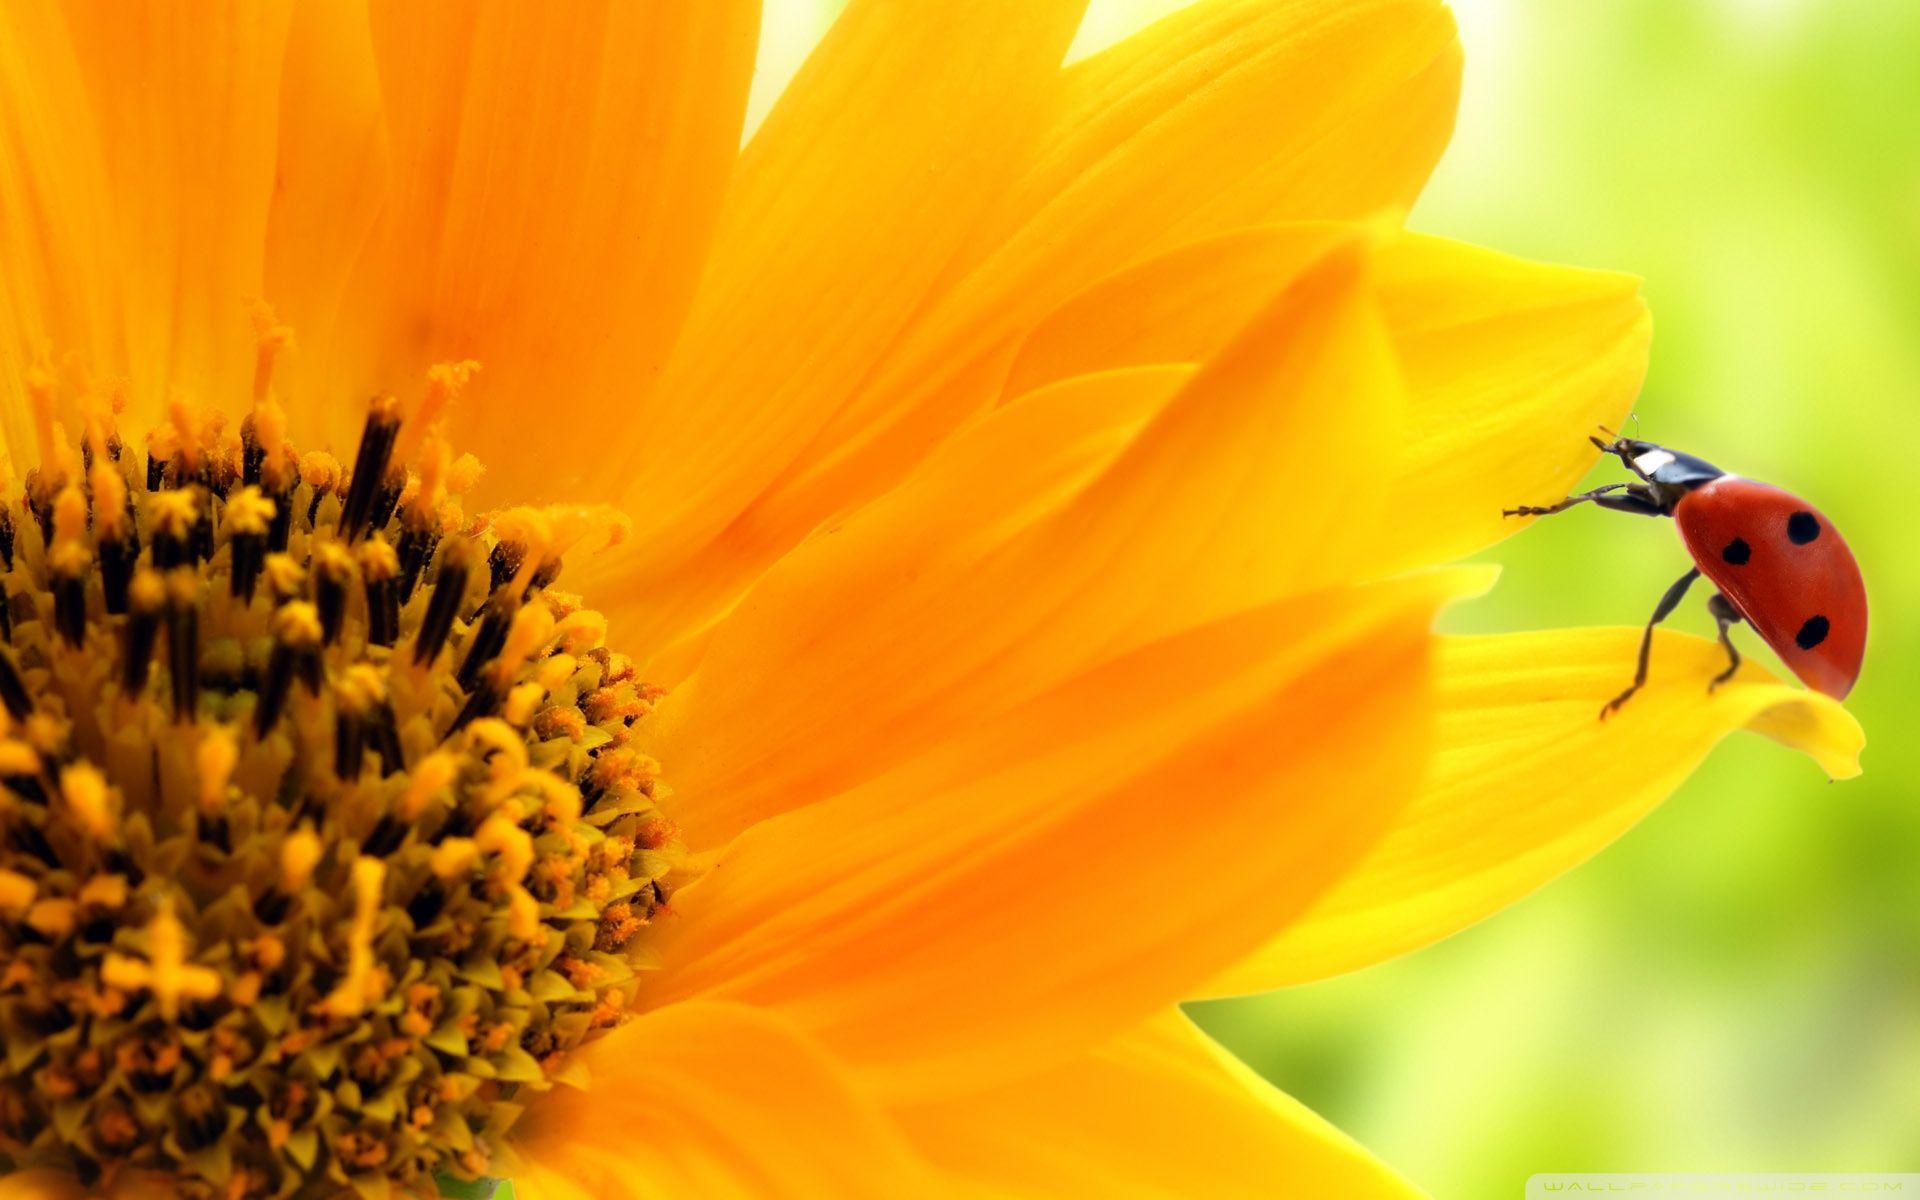 sunflower and ladybug hd desktop wallpaper : high definition